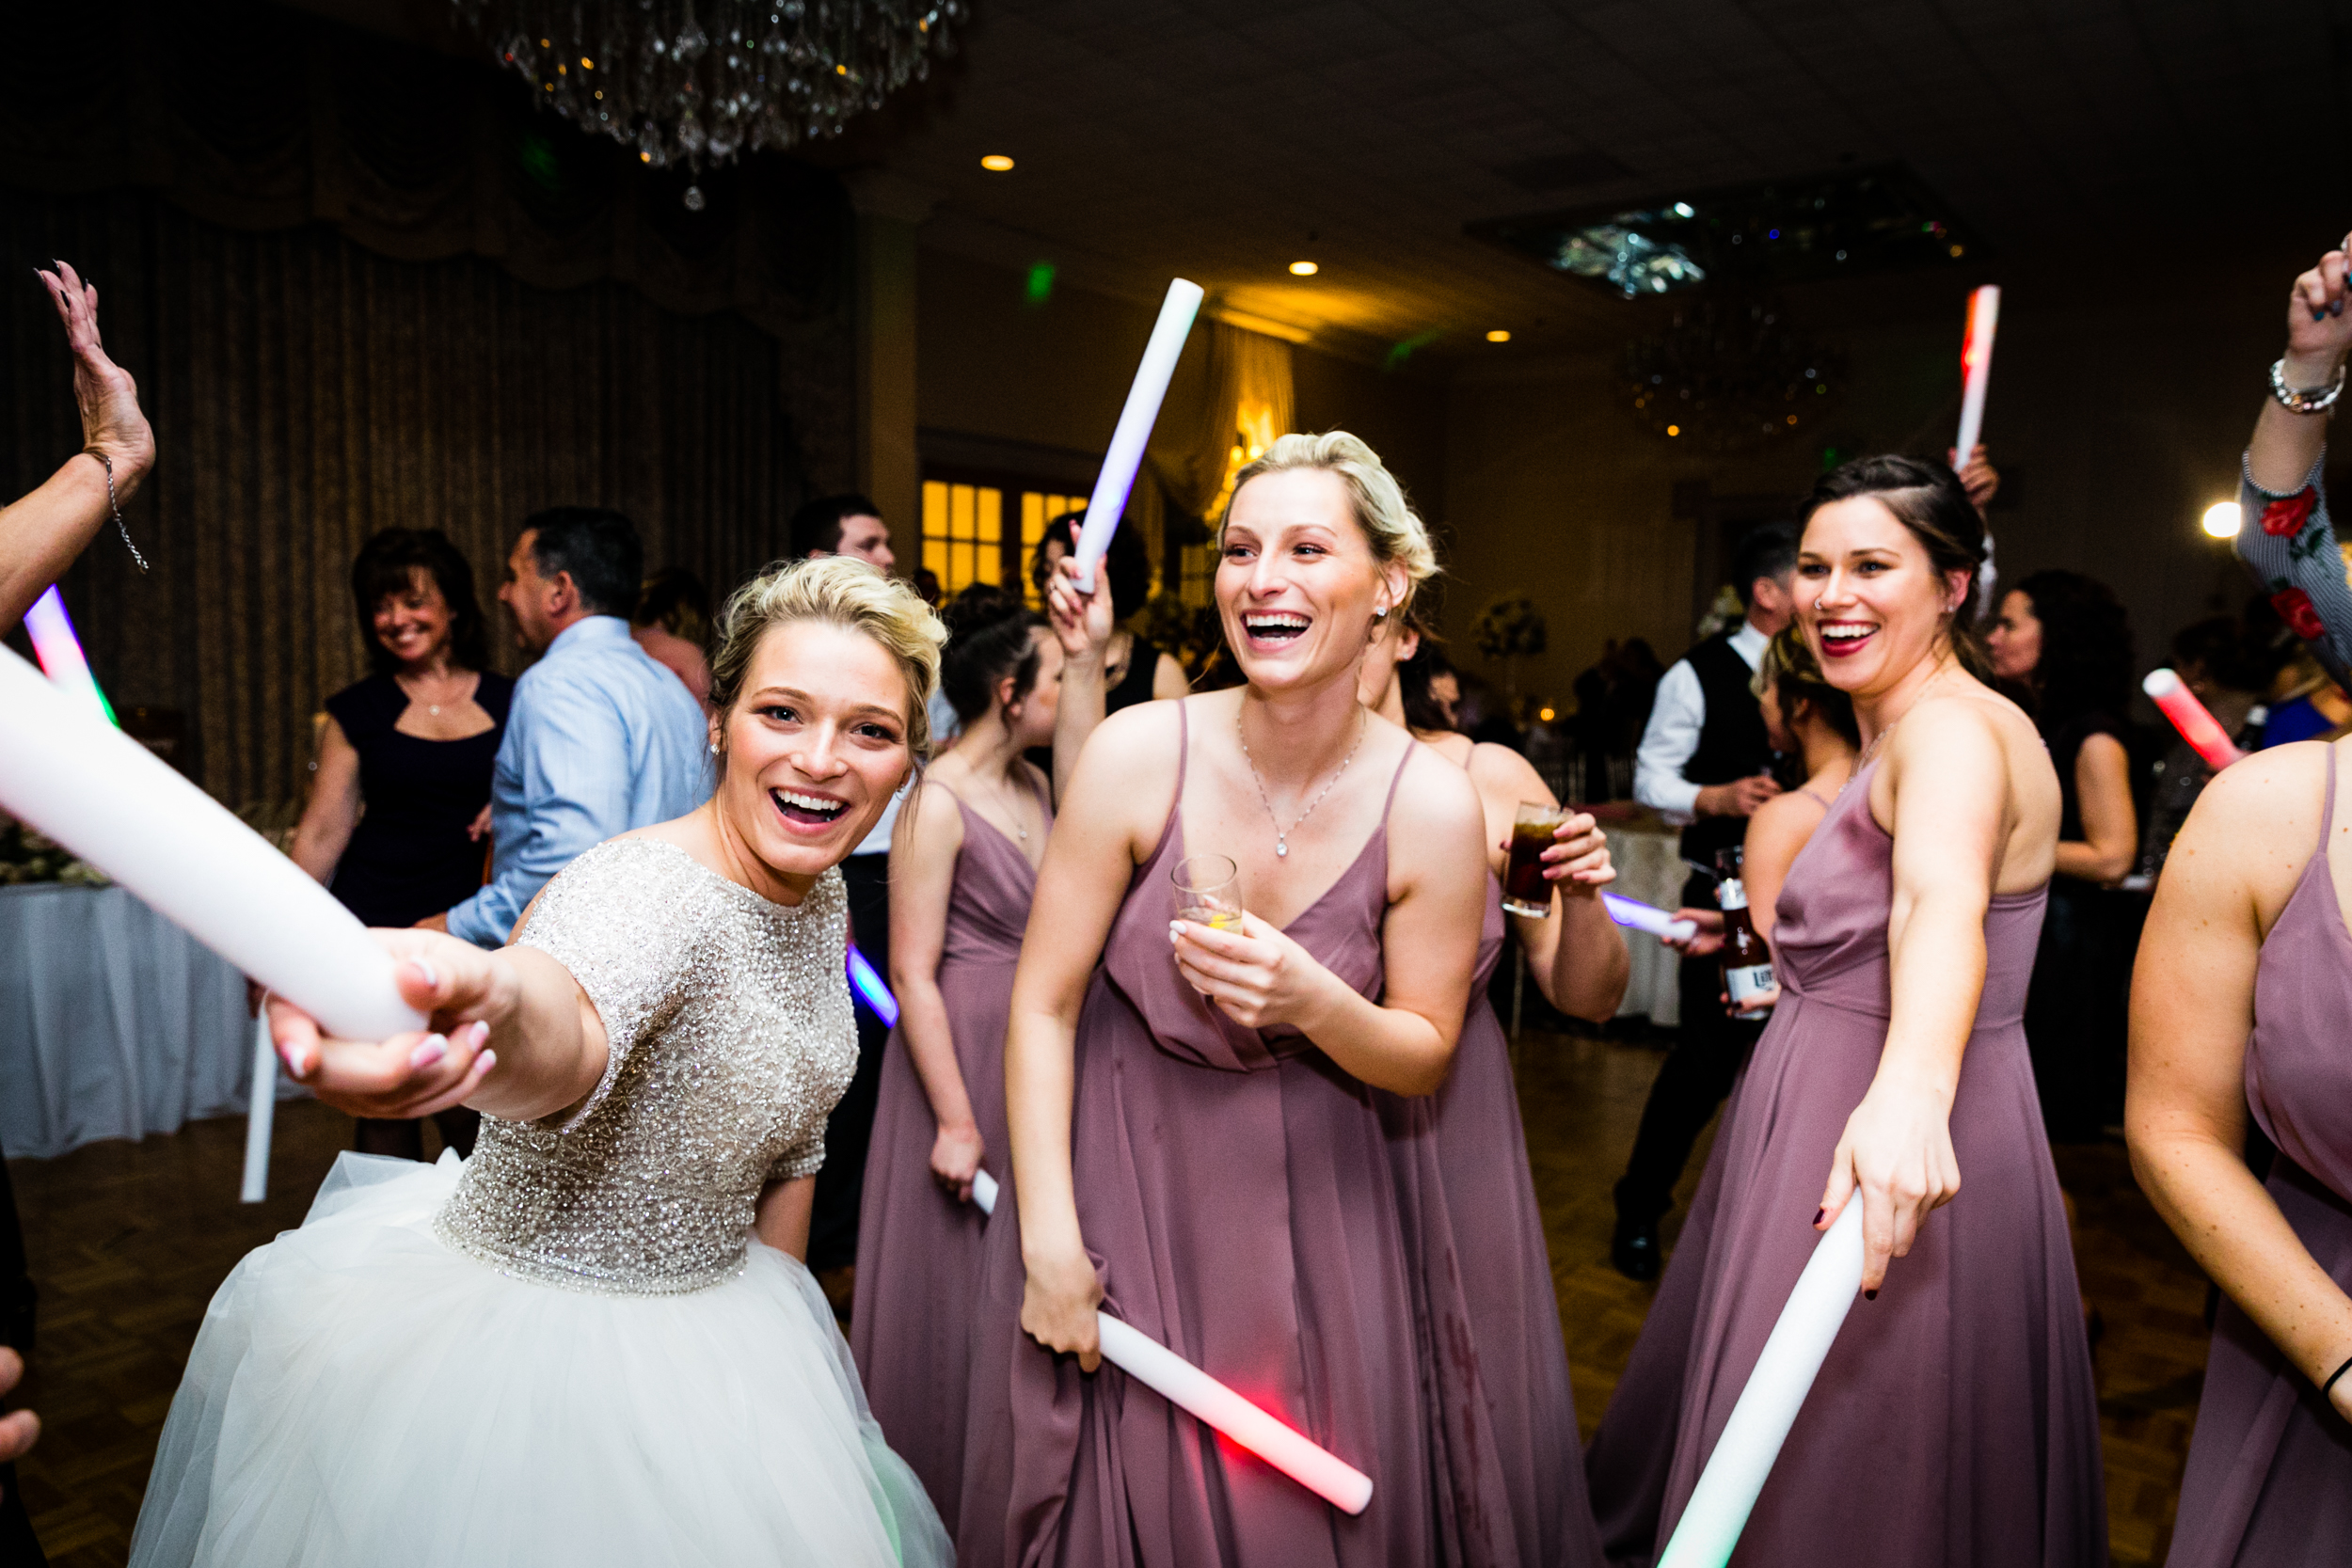 CELEBRATIONS BENSALEM WEDDING PHOTOGRAPHY-105.jpg